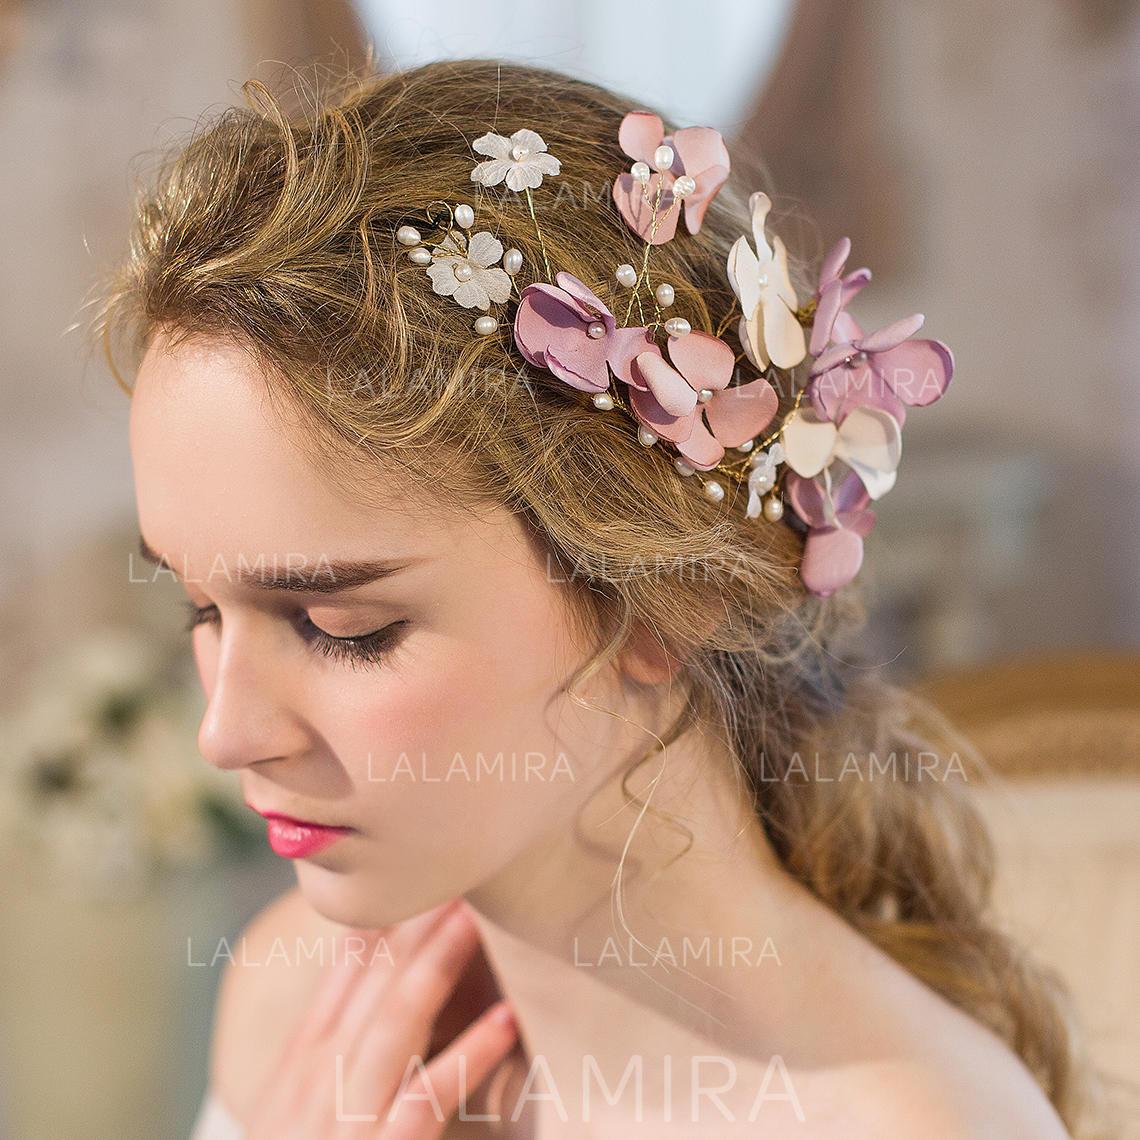 Flowers Feathersheadbands Weddingspecial Occasioncasualoutdoor